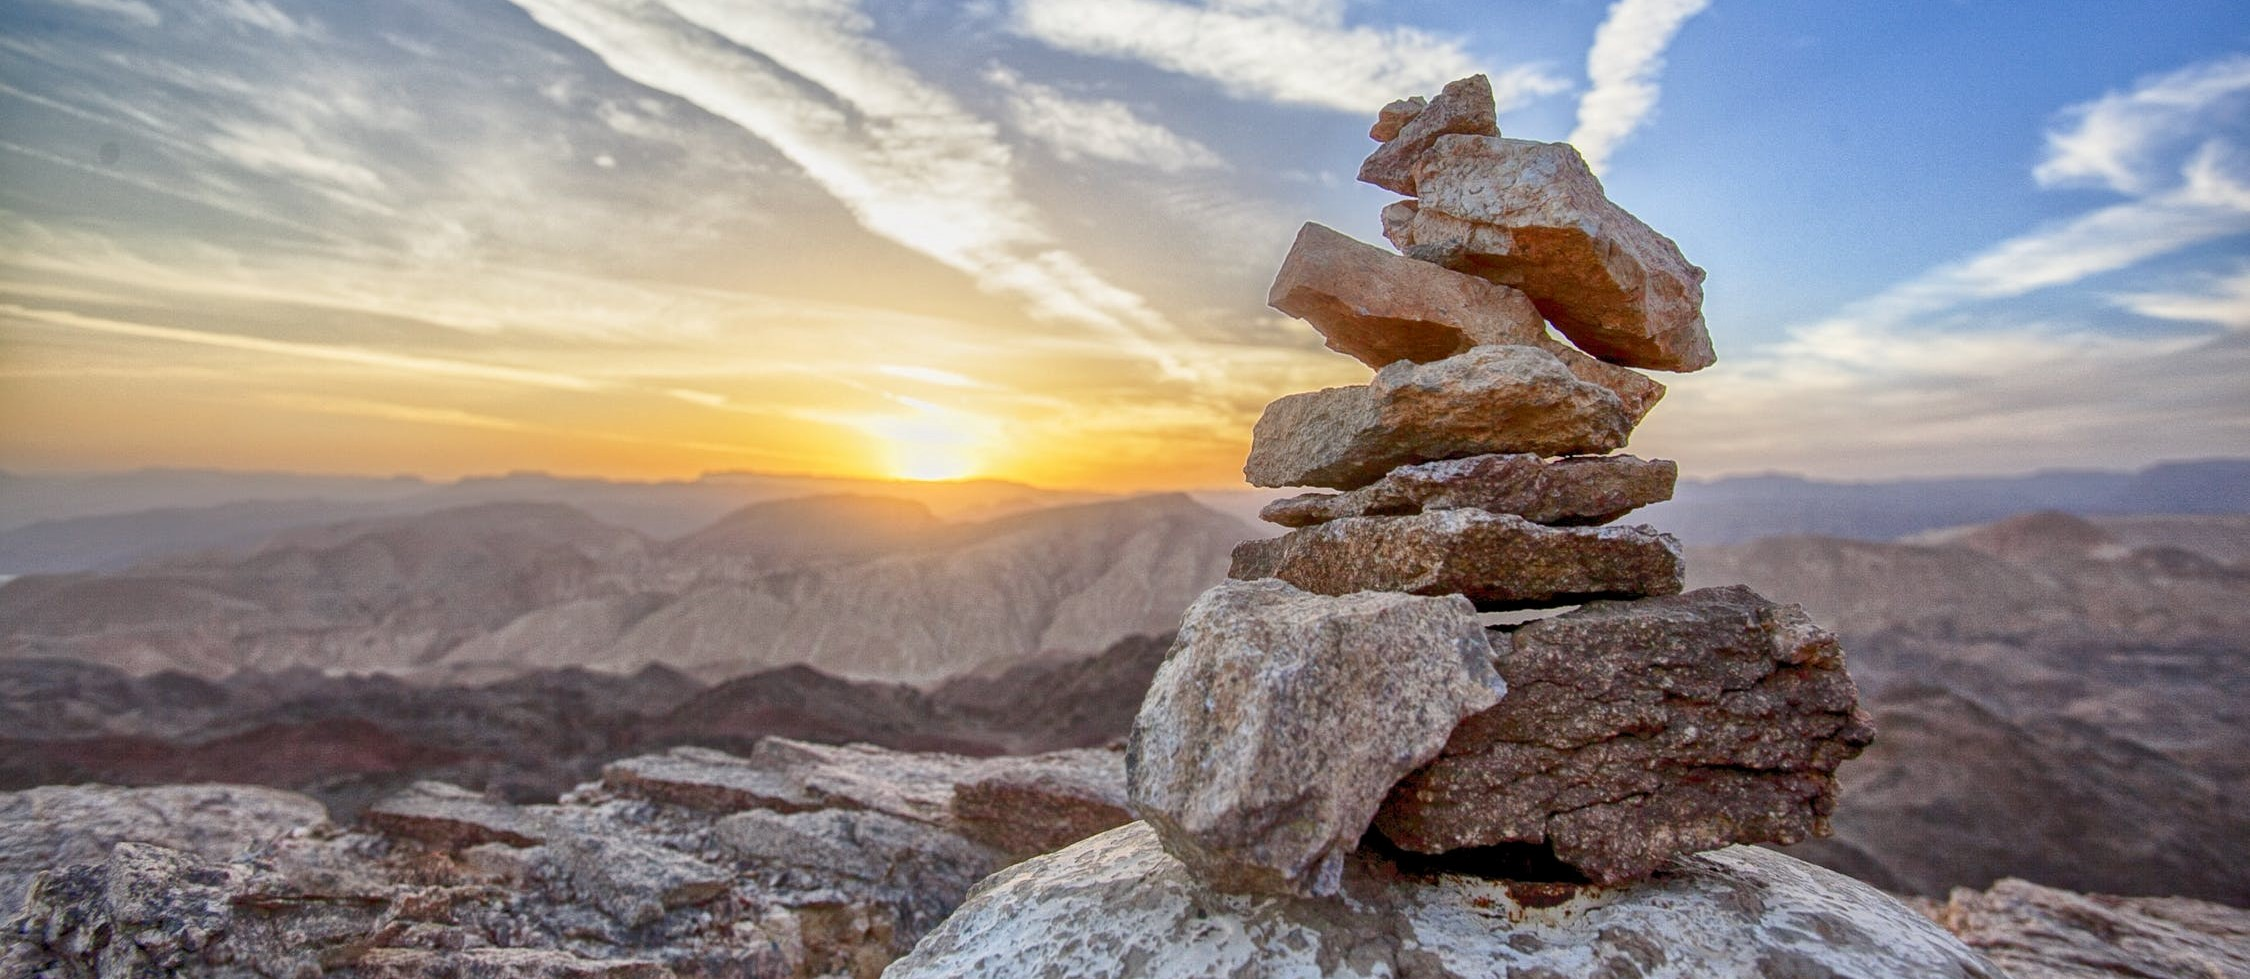 balanced rocks on a mountain top